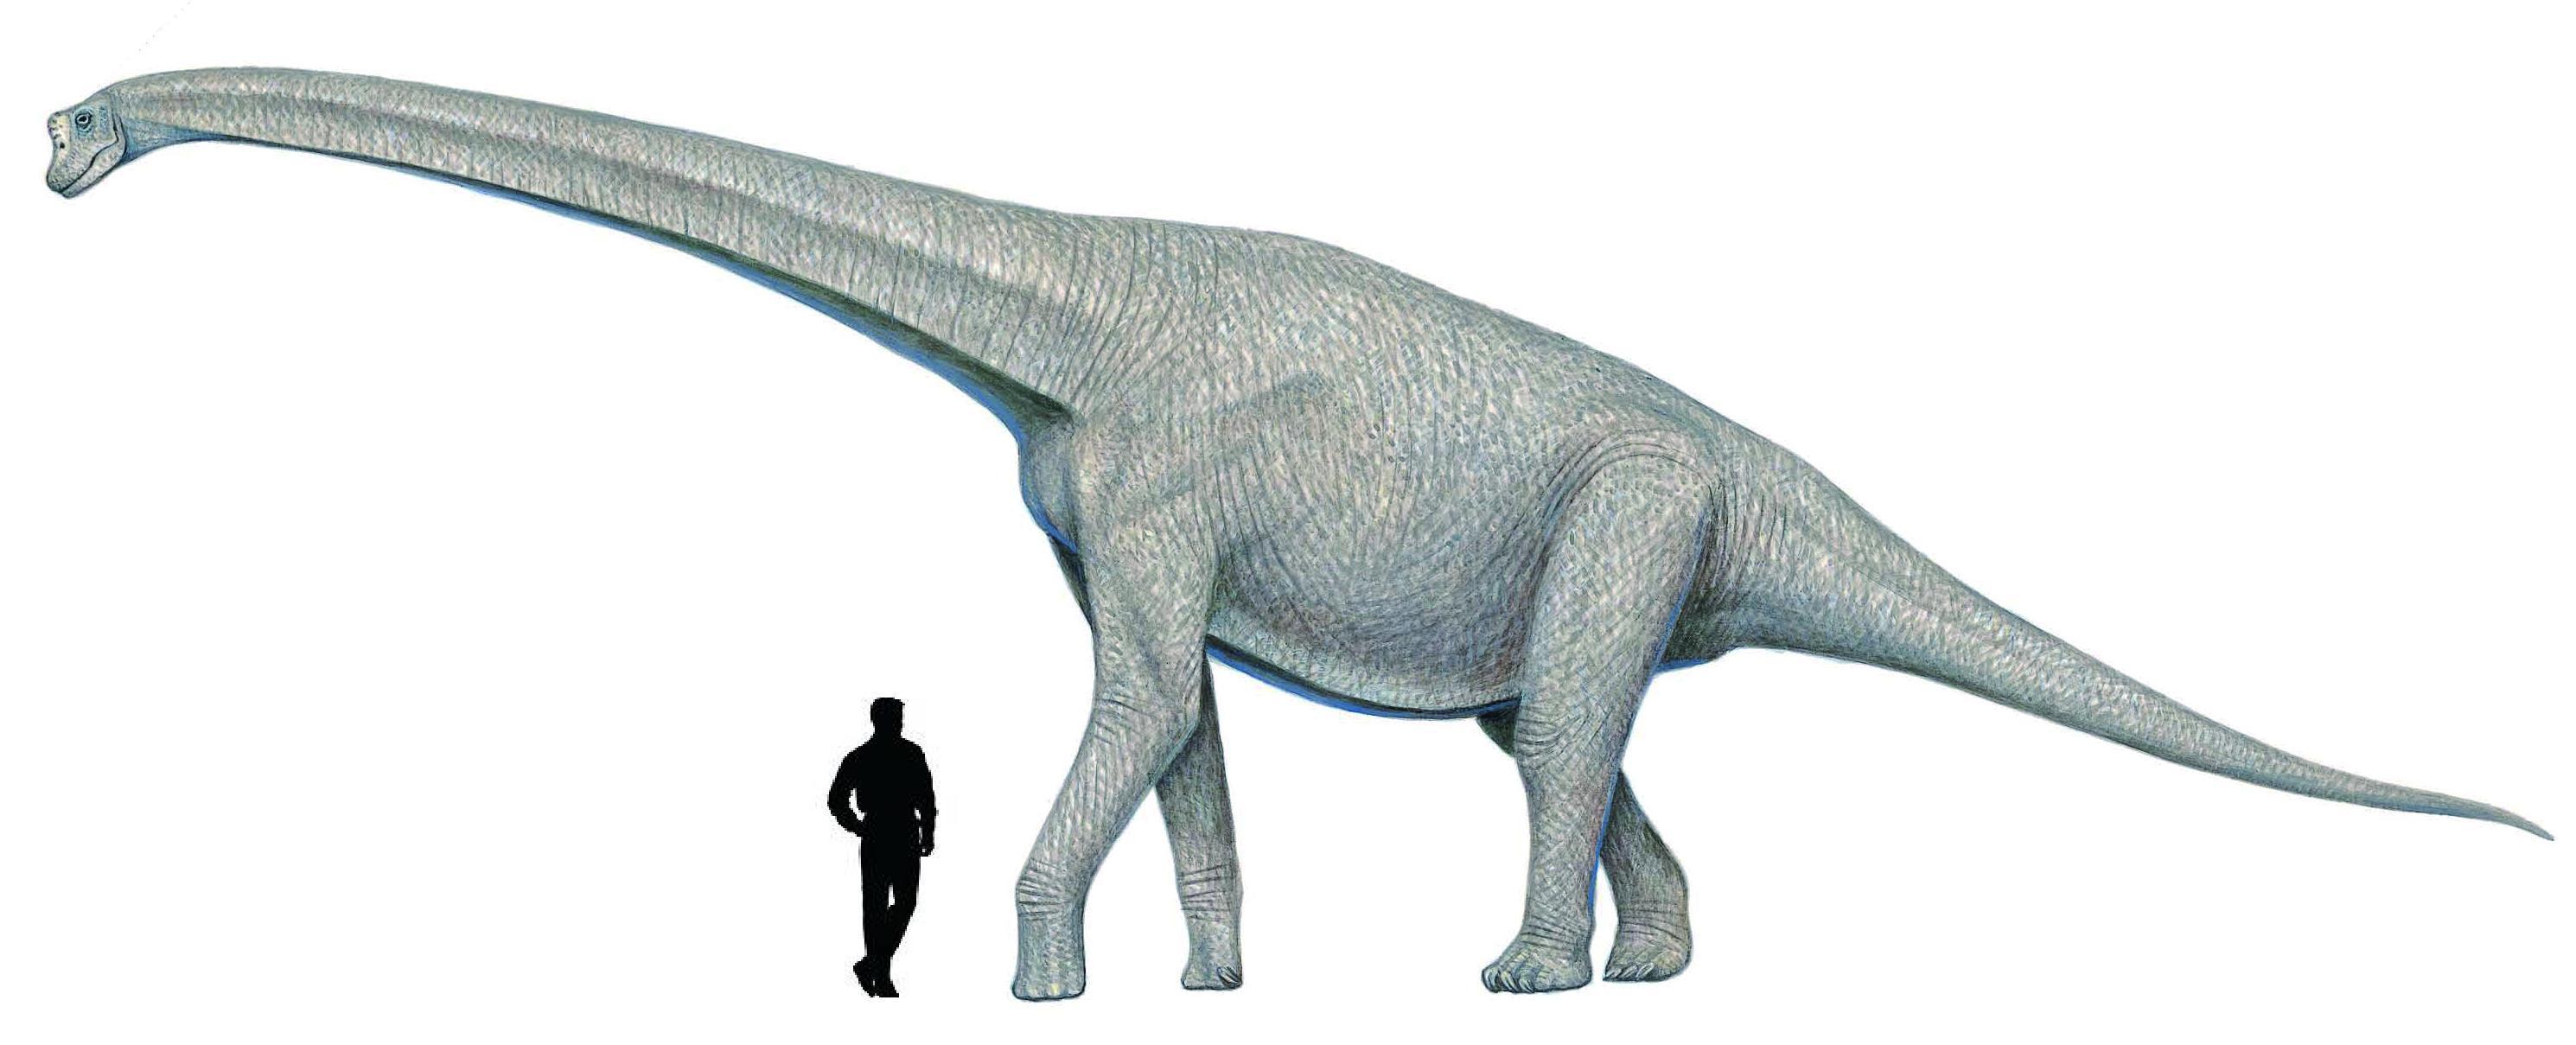 Abrosaurus size